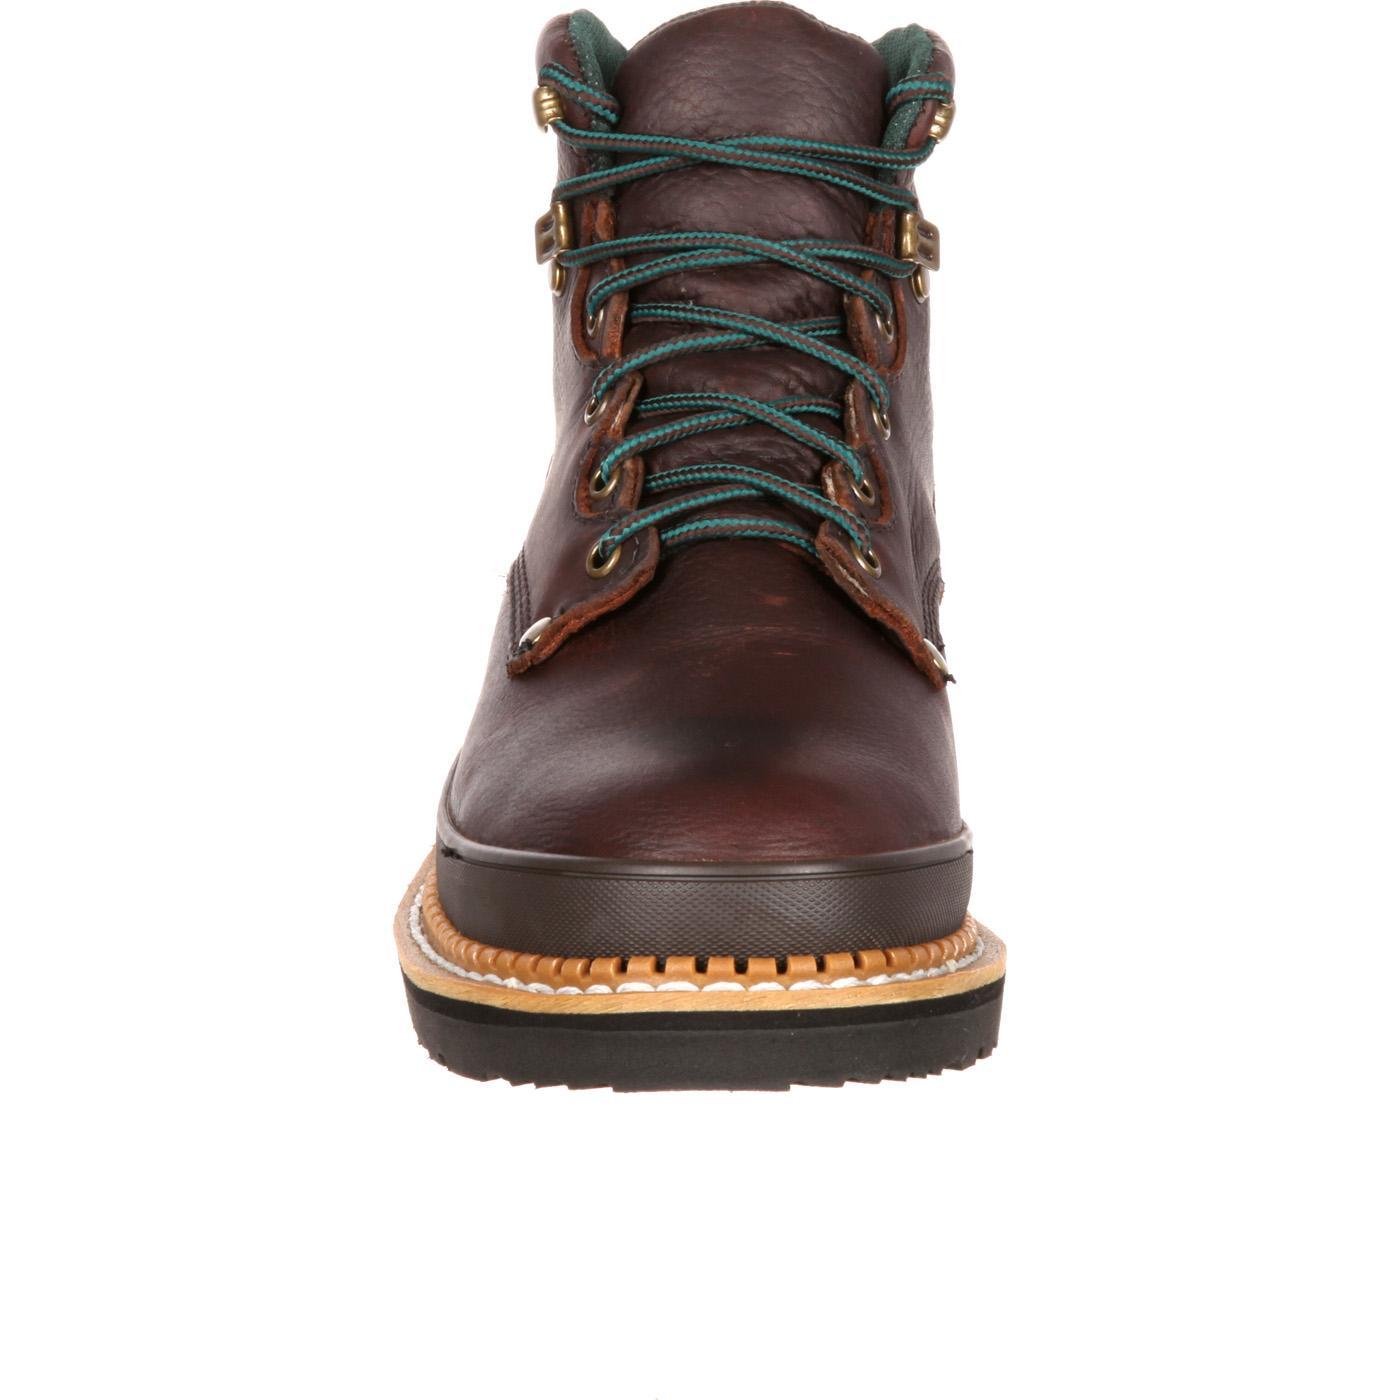 Lehigh Steel Toe Work Boot 5040